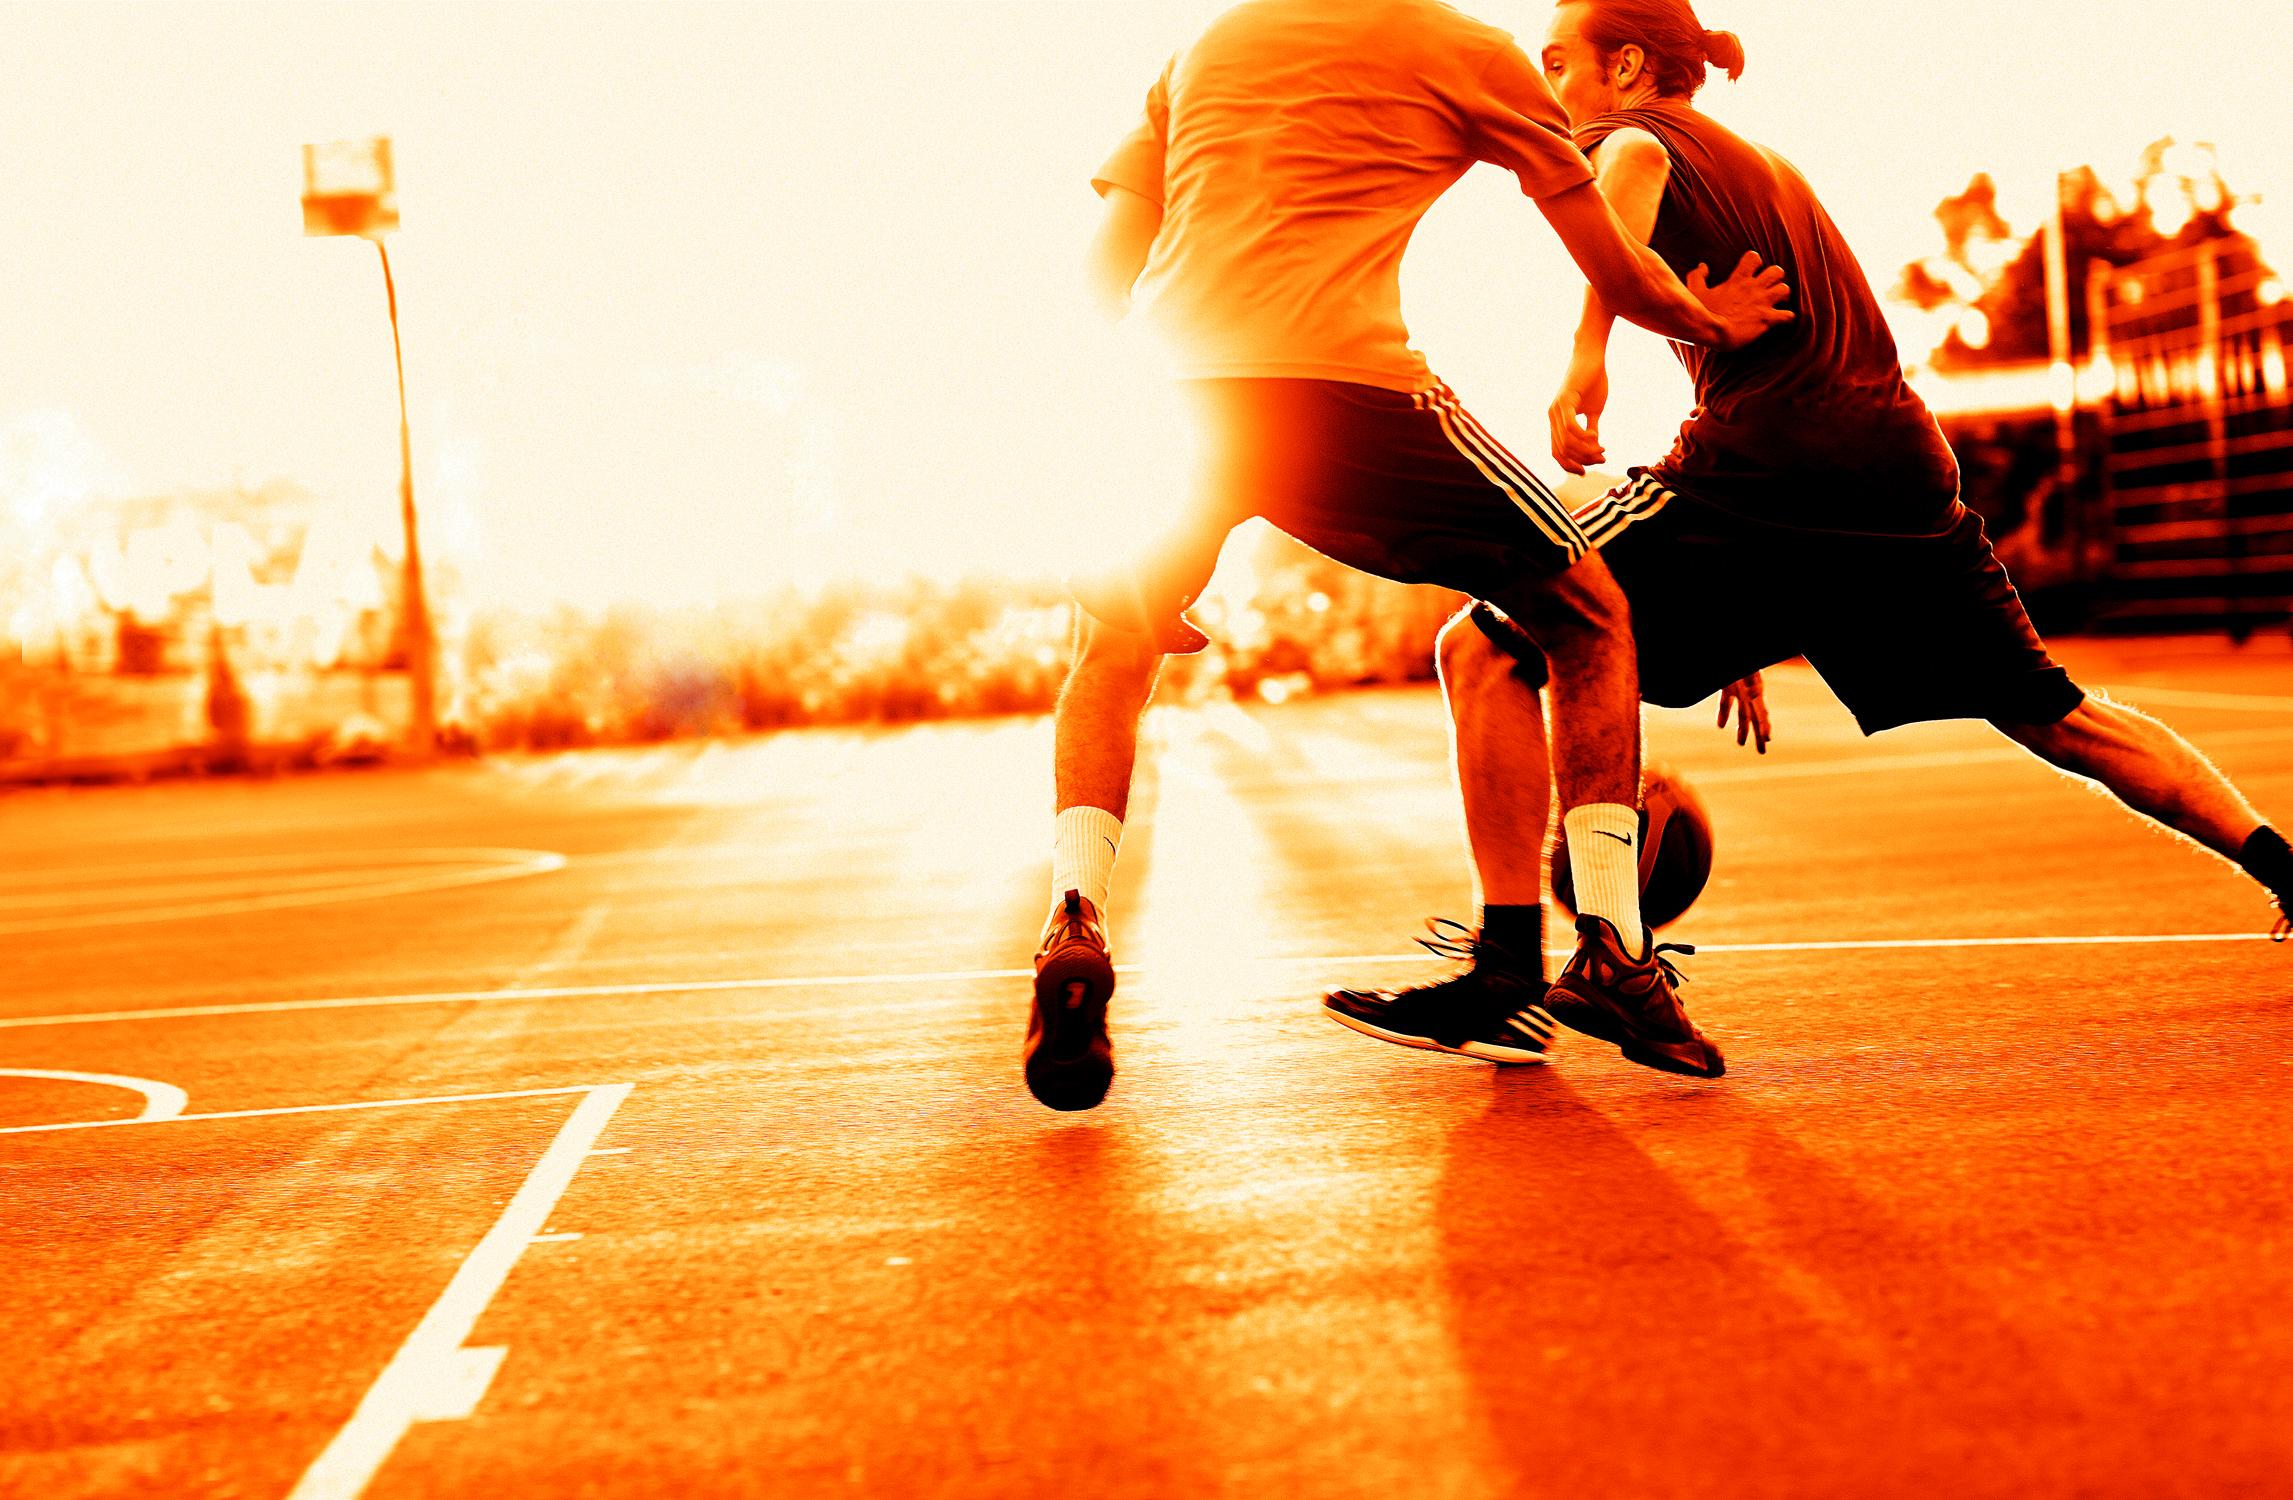 Parks Atheletics Basketball13